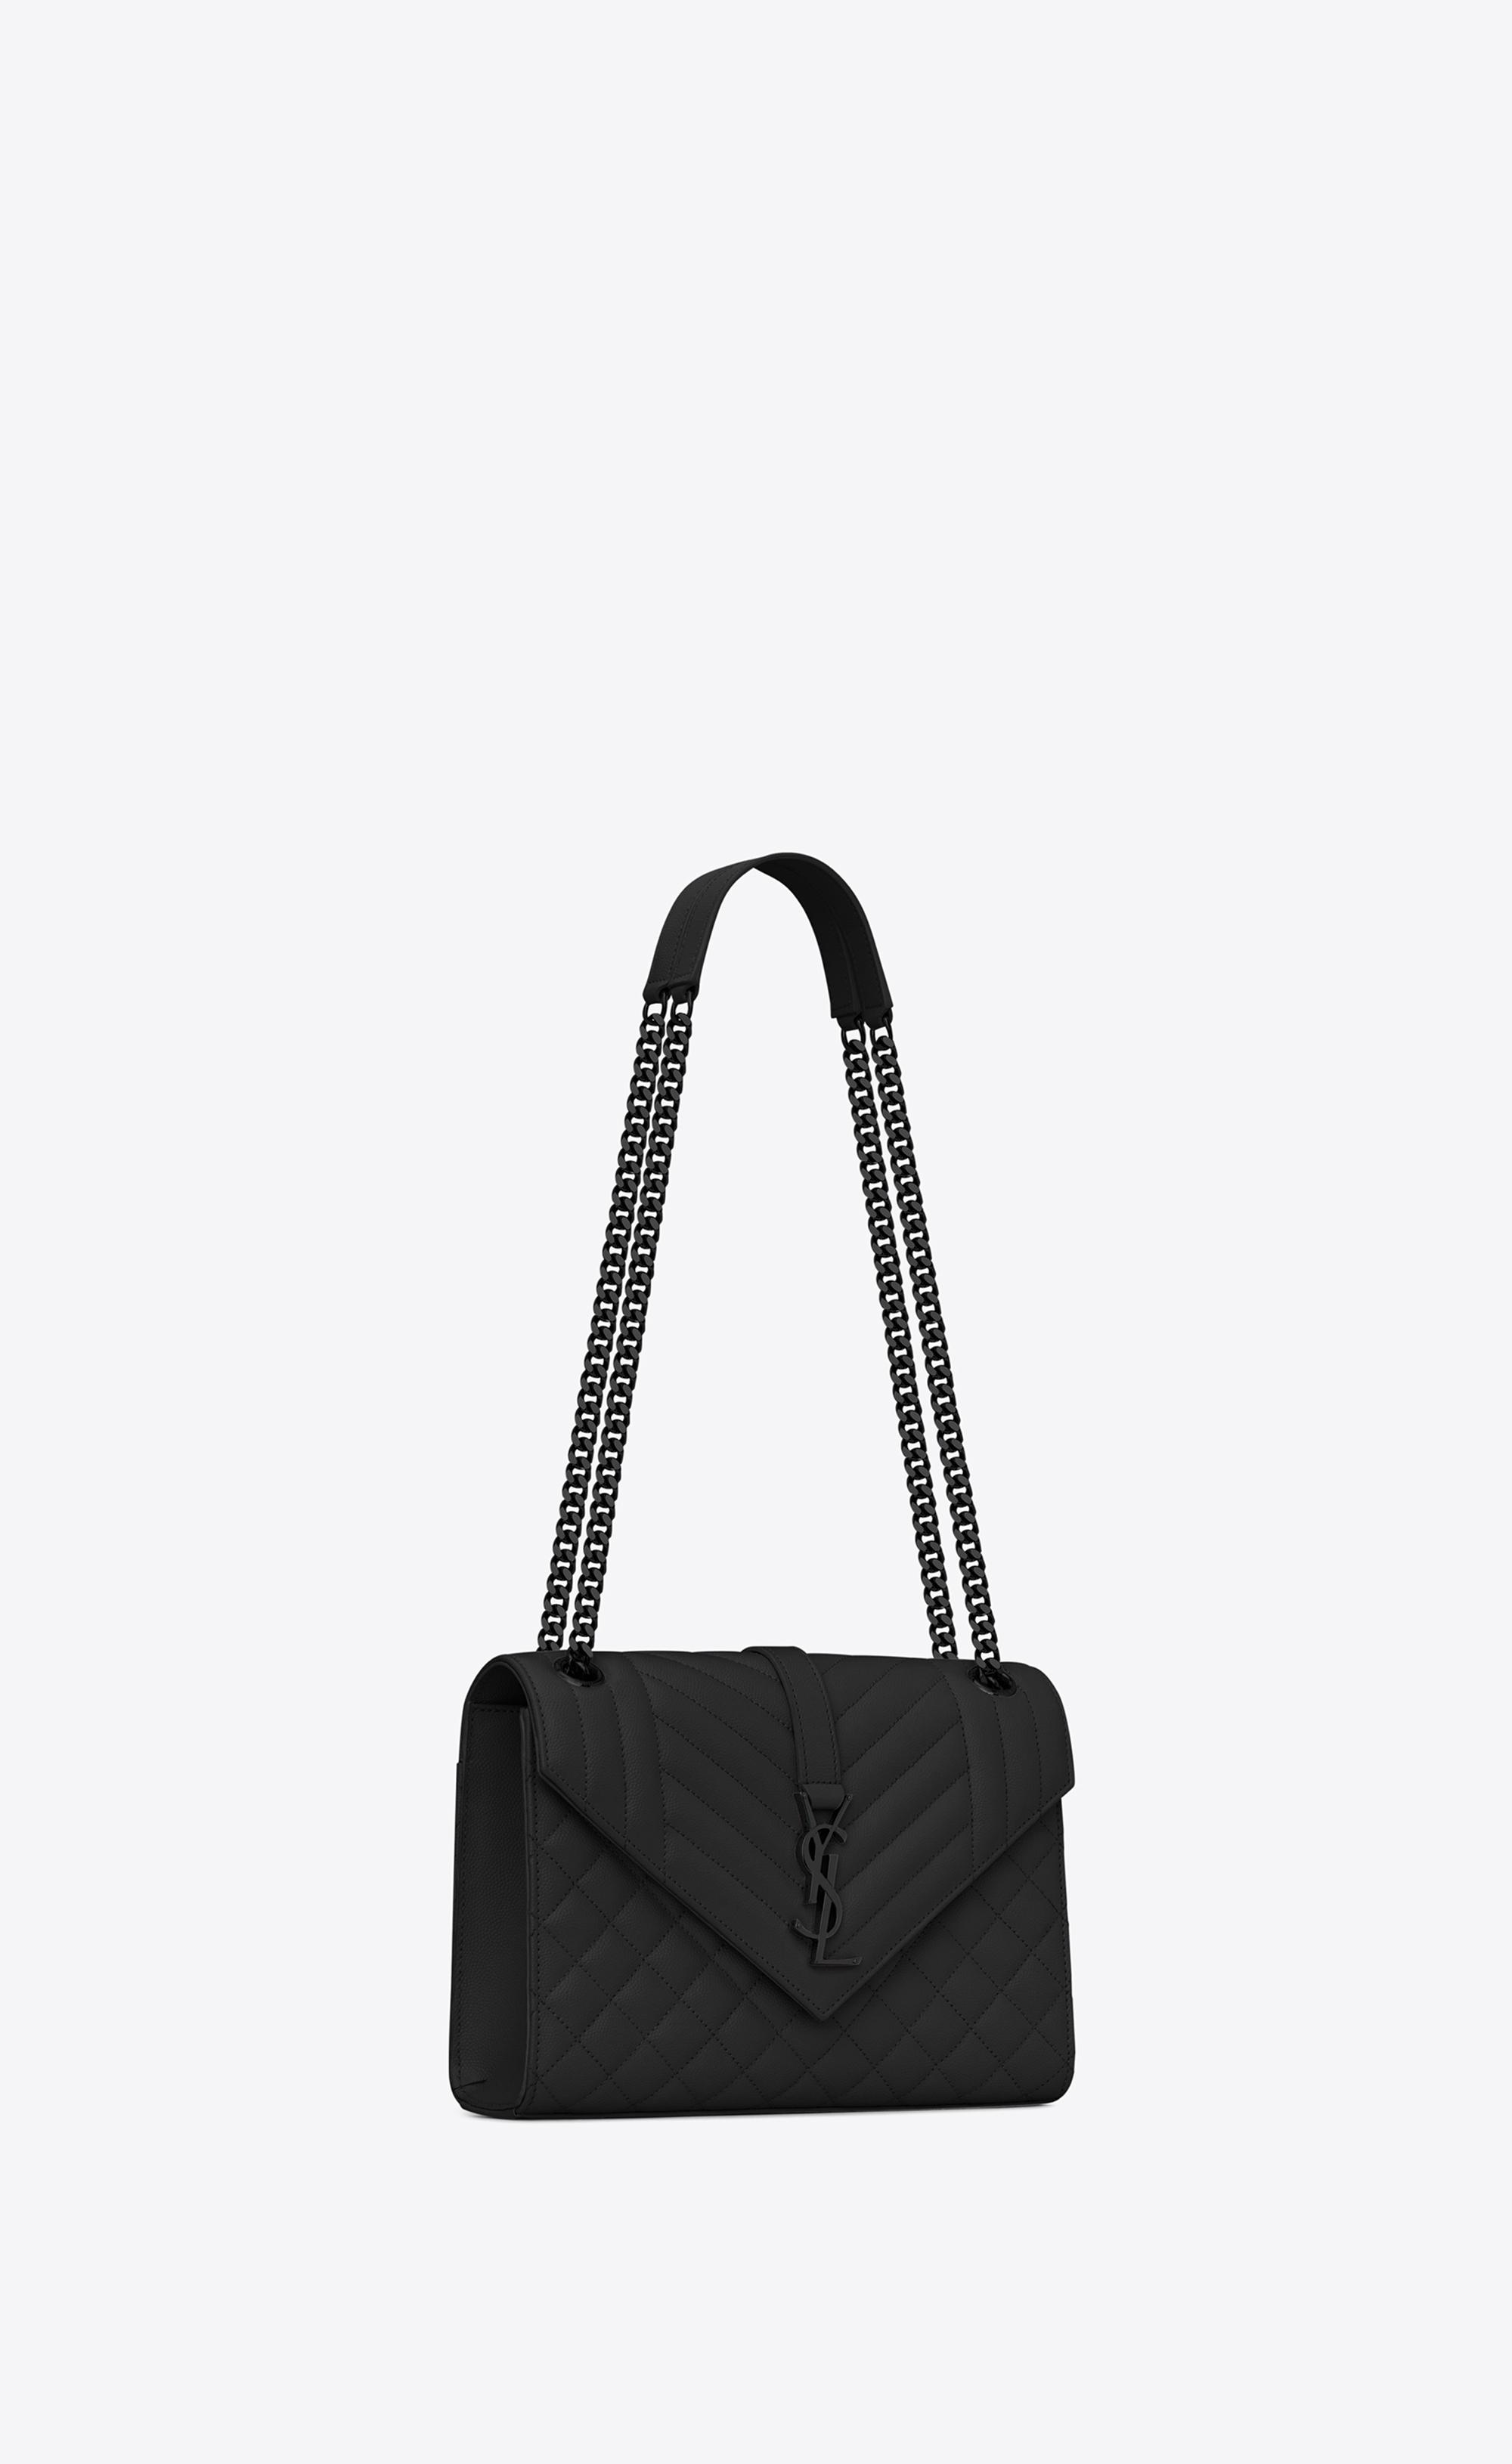 0fd69b505312 Saint Laurent Envelope Medium Bag In Grain De Poudre Embossed ...